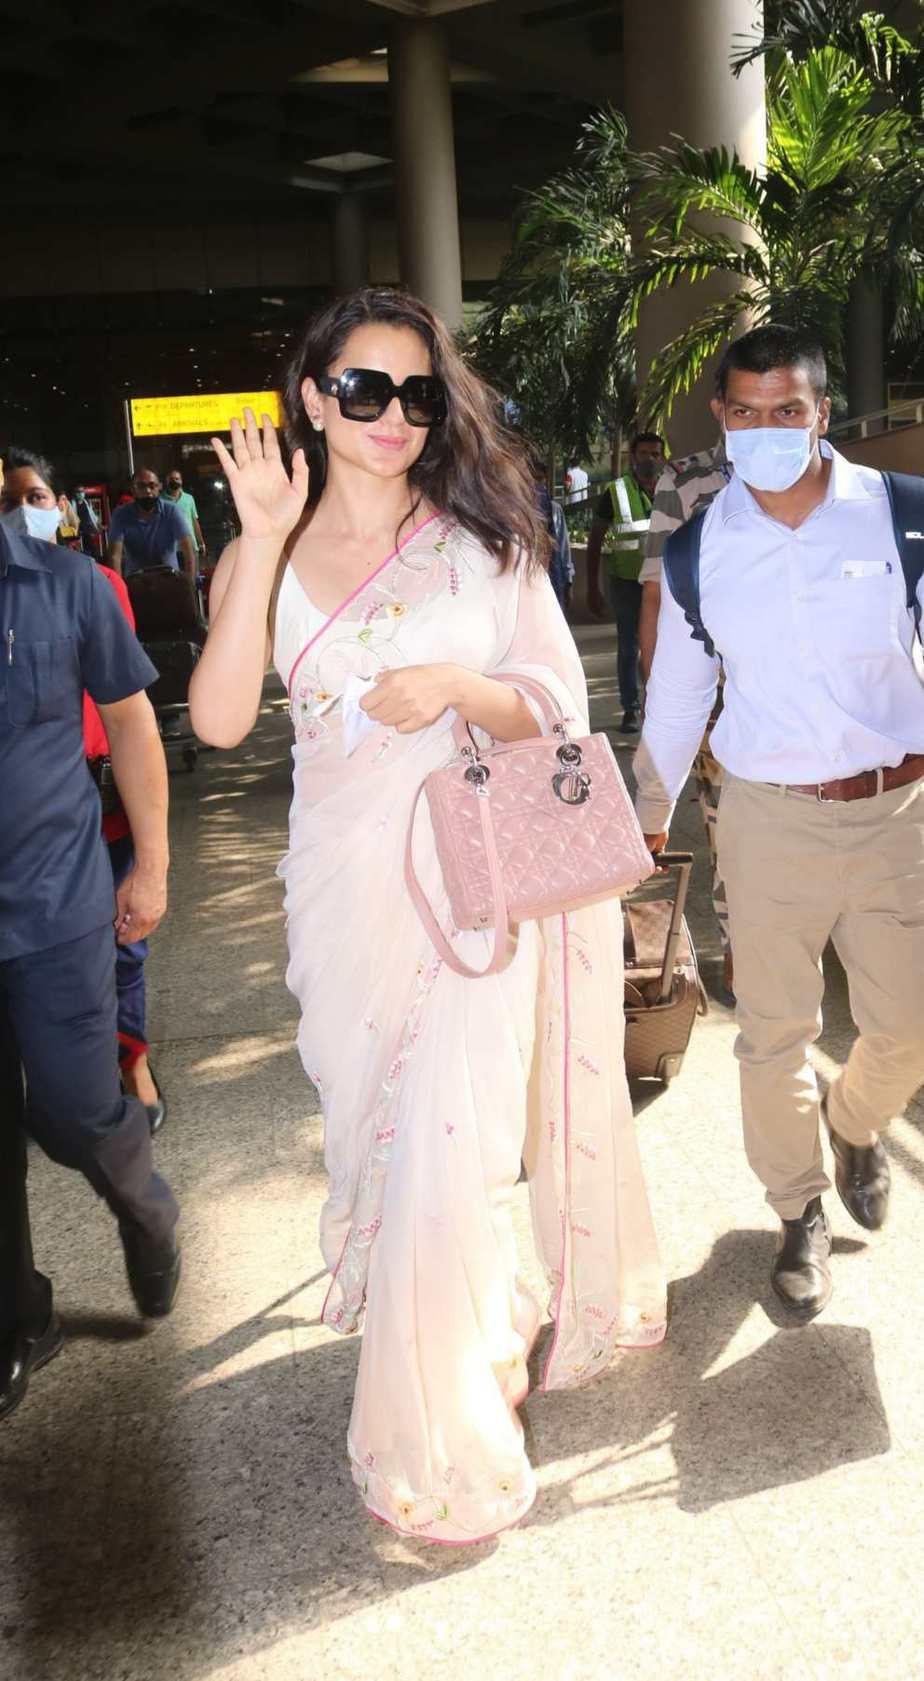 Kangana Ranaut spotted at airport arrival in pink saree